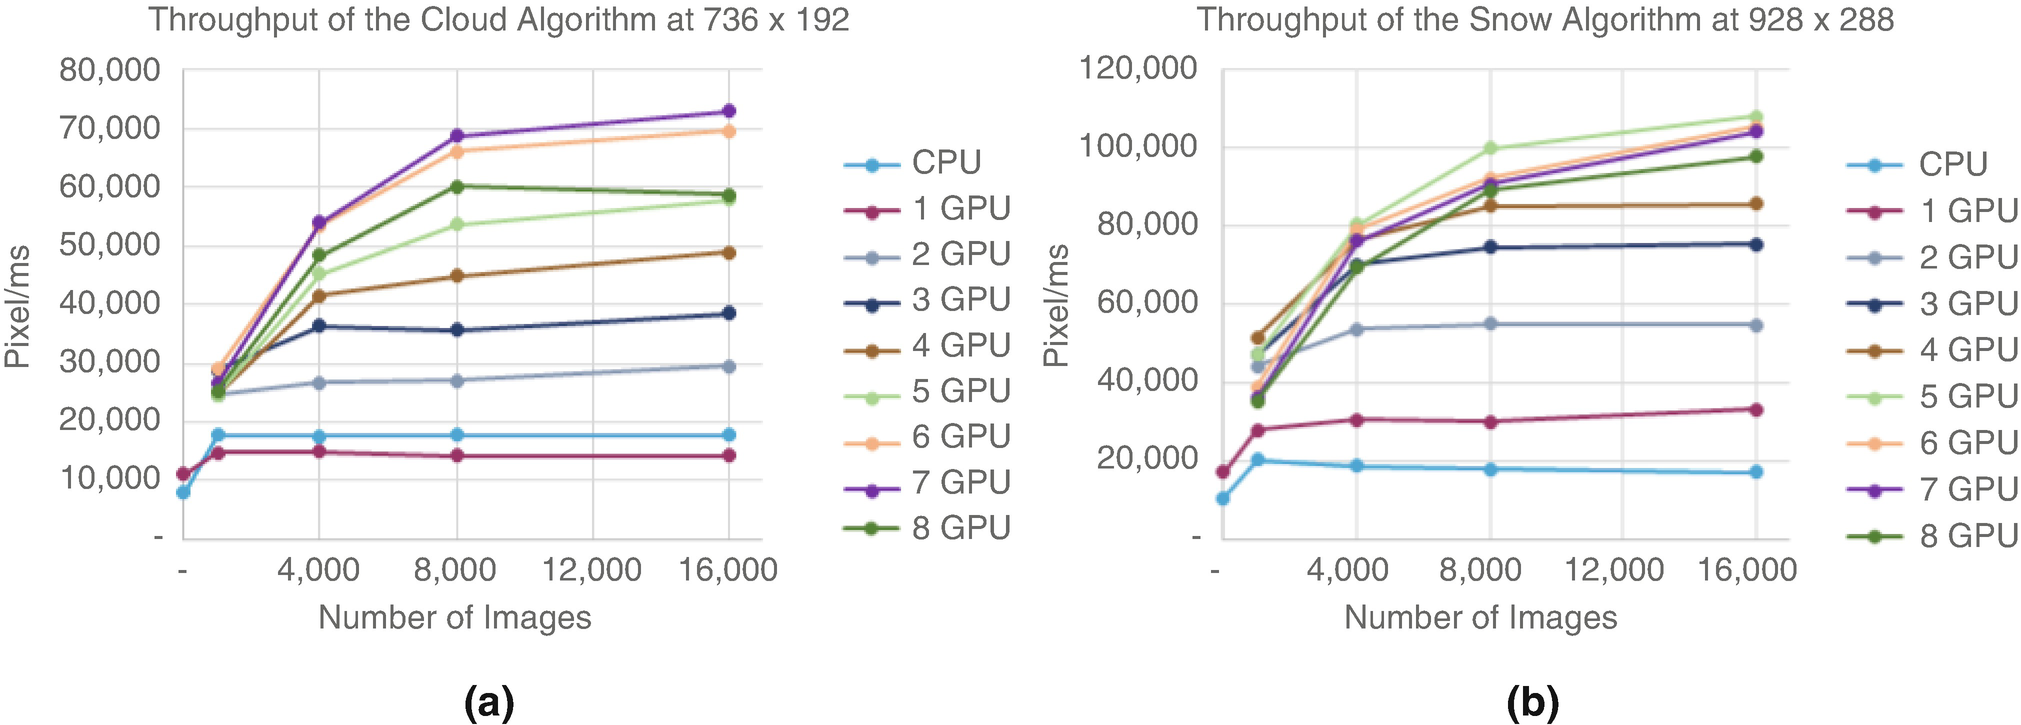 Image Processing Using Multiple GPUs on Webcam Image Streams